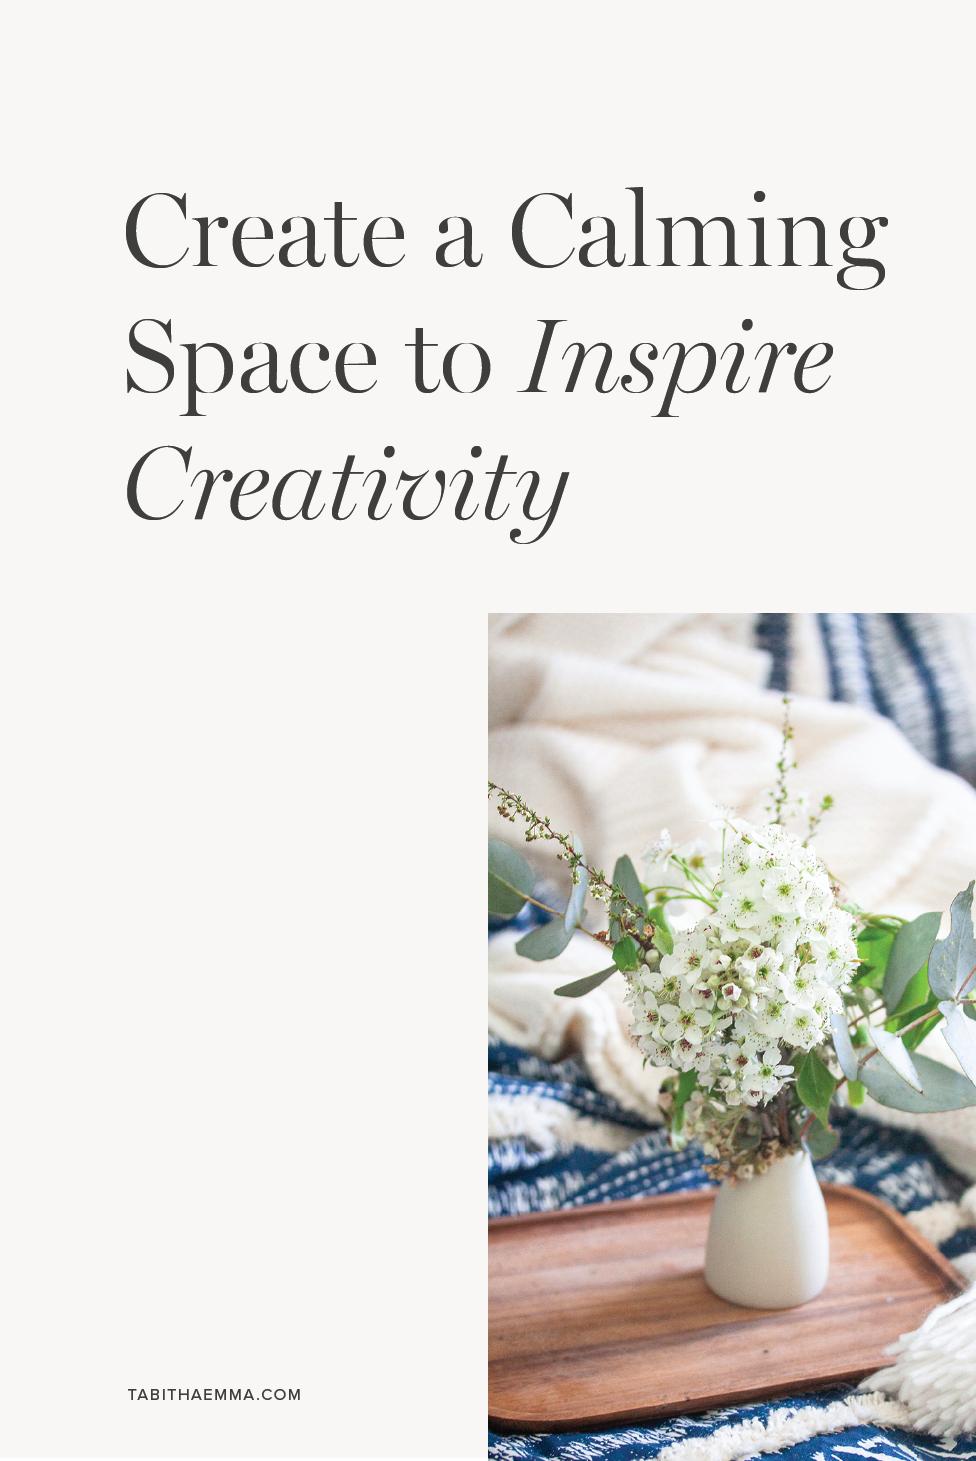 inspire_creativity_space